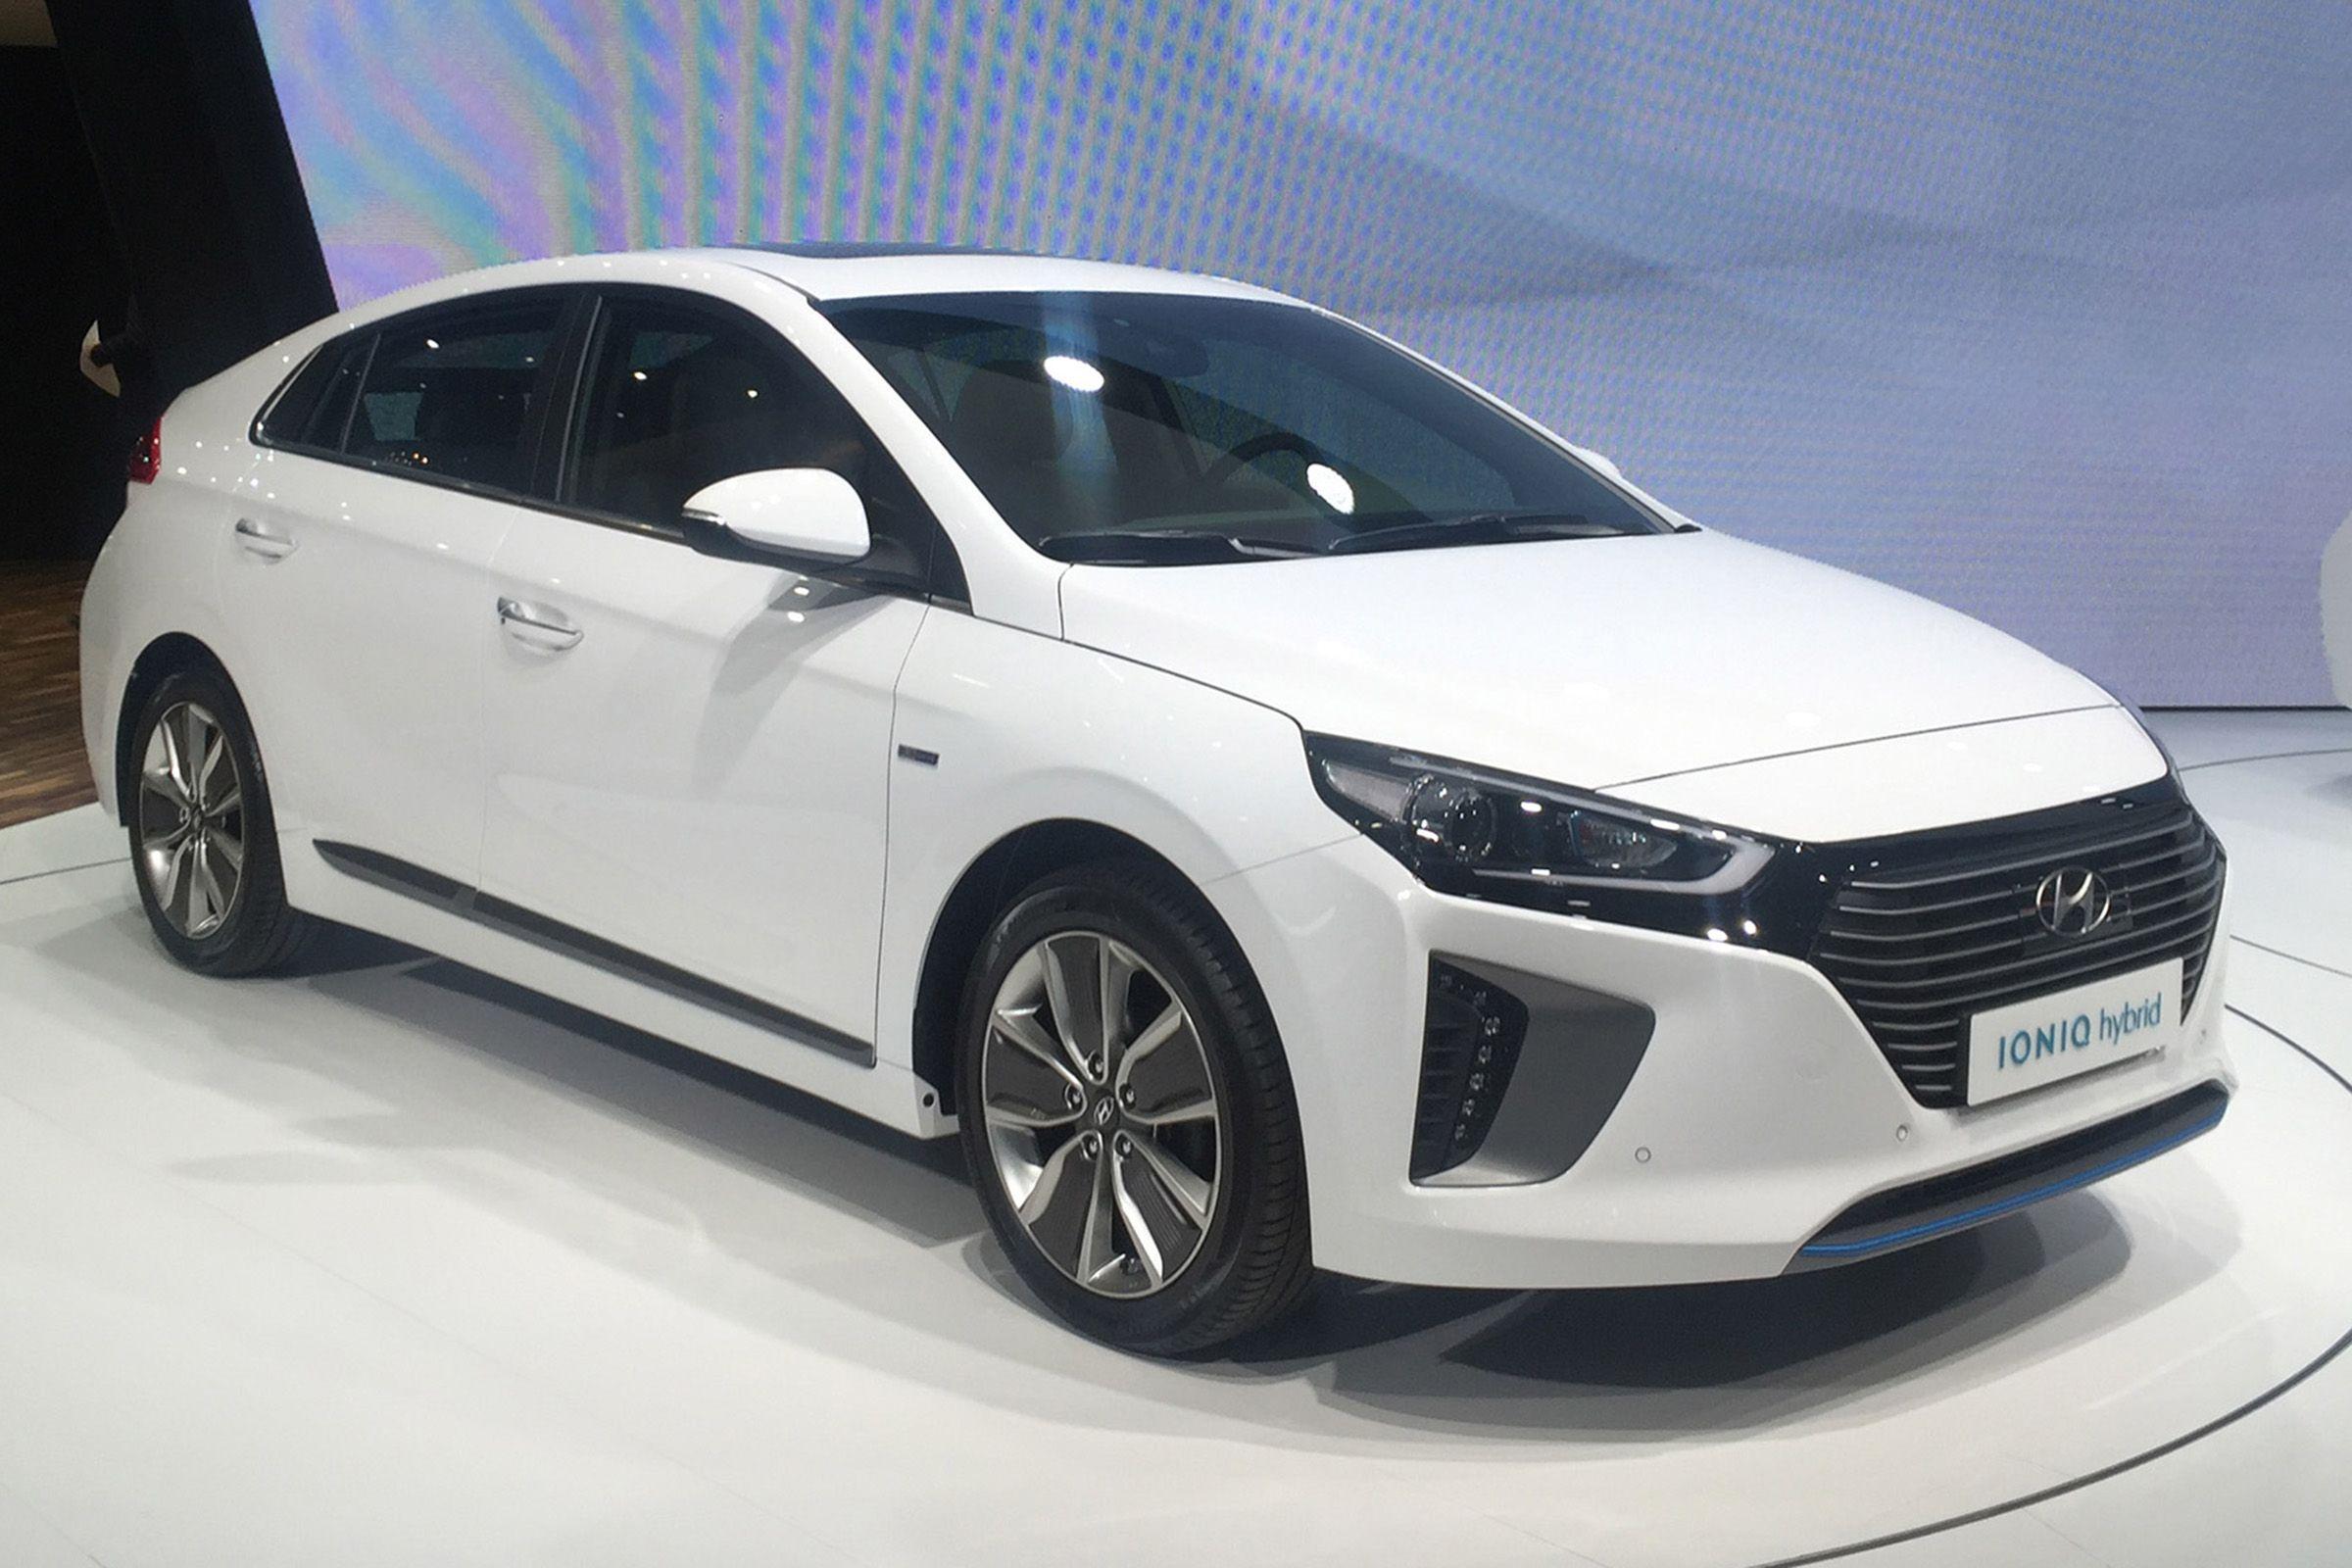 New Hyundai Ioniq 2016 Full Uk Pricing And Specs Announced Auto Express